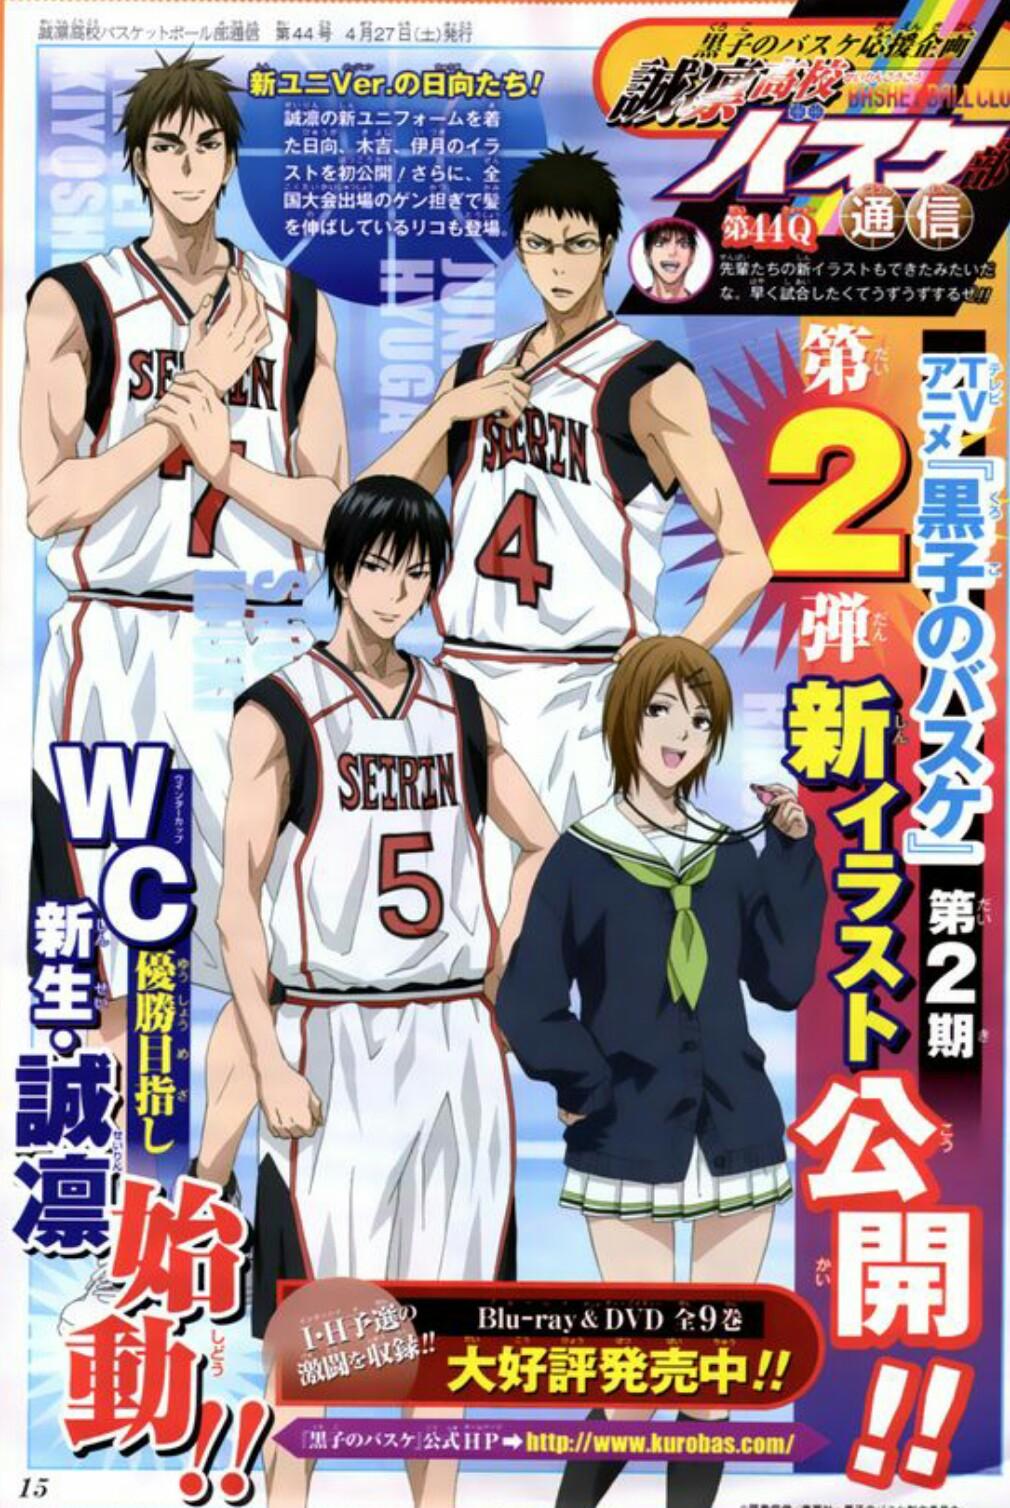 Kuroko no Basket Temporada 2 Subtitulado 720p